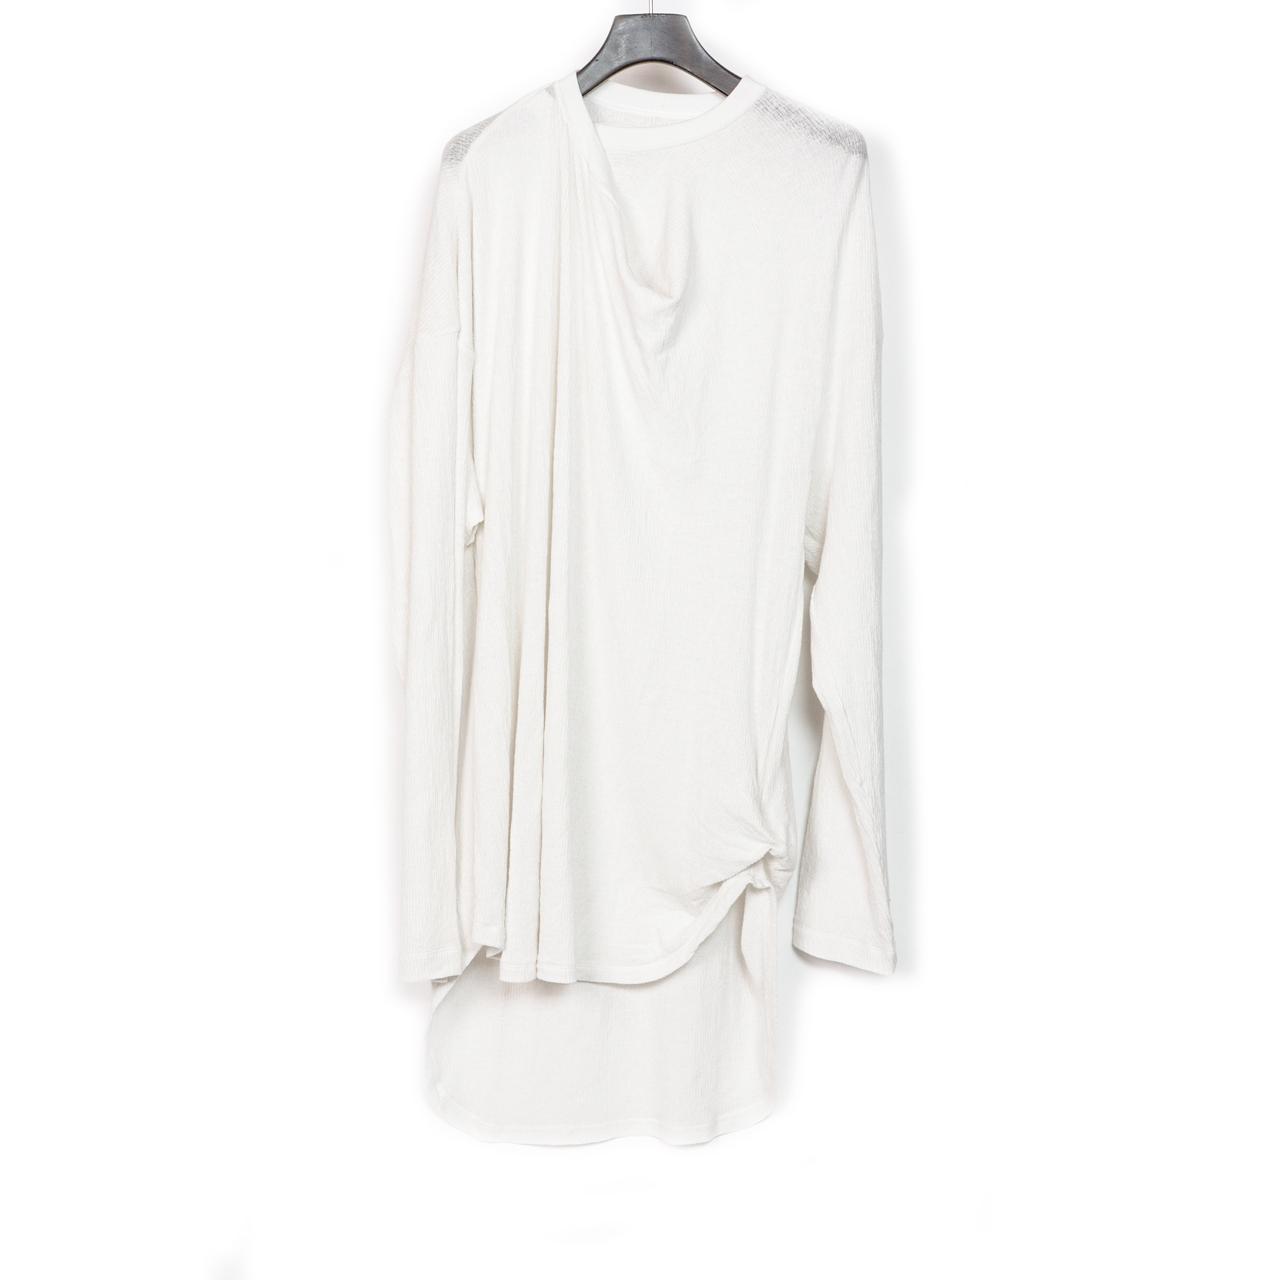 697CUM9-WHITE / ネックドレープロングスリーブ Tシャツ